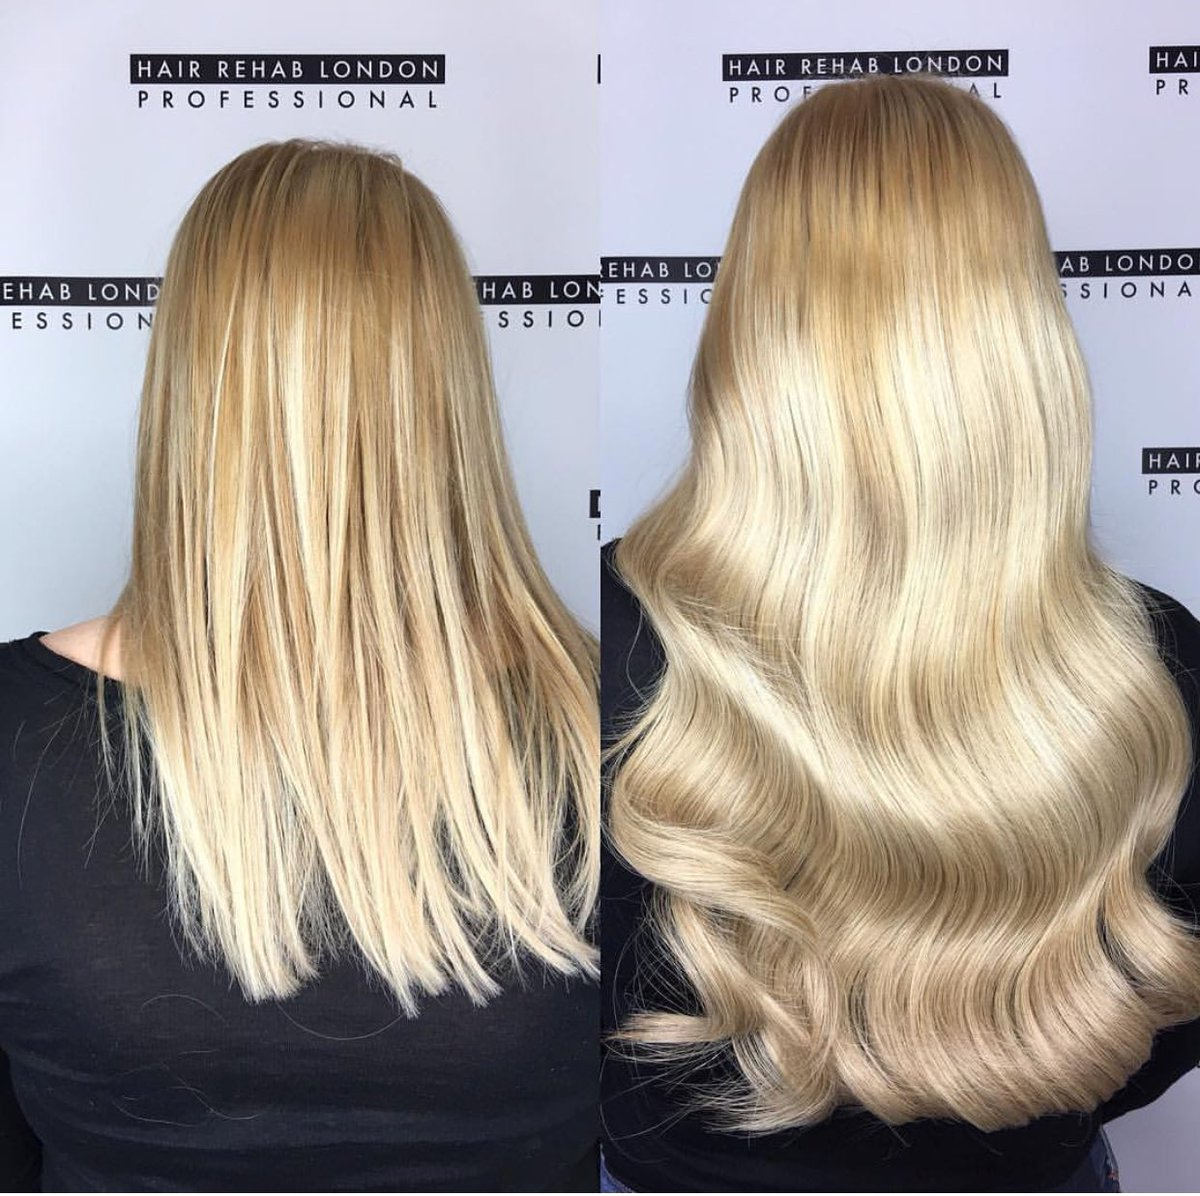 Hair Rehab London On Twitter Blonde Blends Giving Us Life